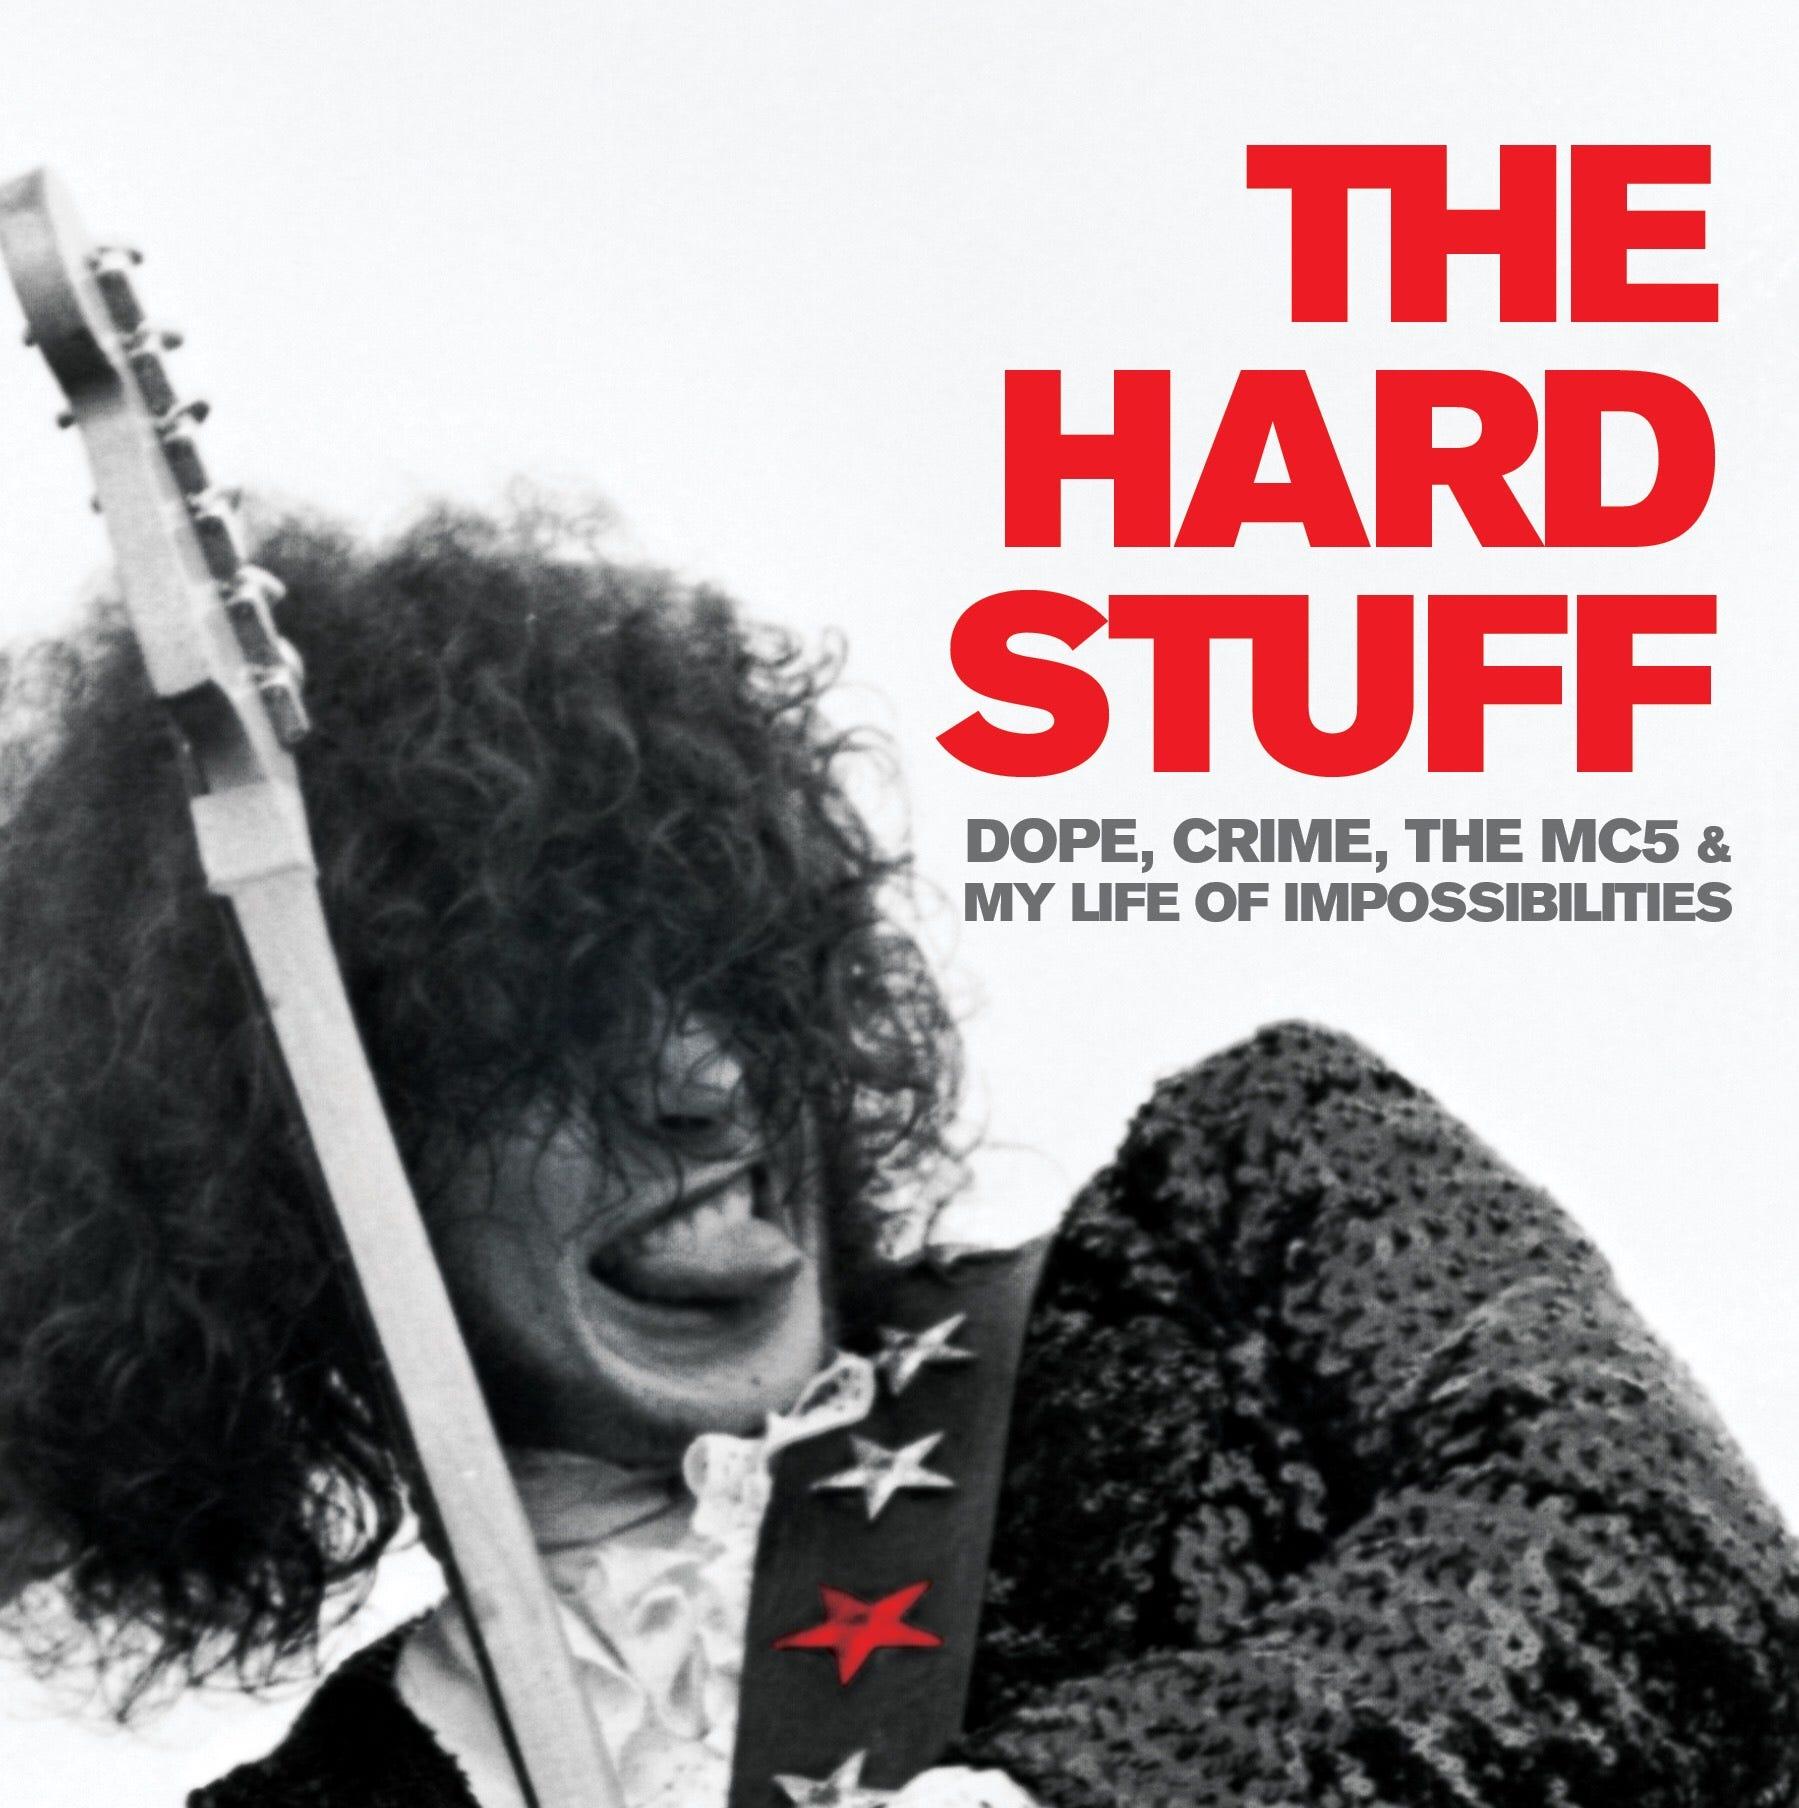 Wayne Kramer book excerpt: Drug deals, dope fiends and 'The Hard Stuff'